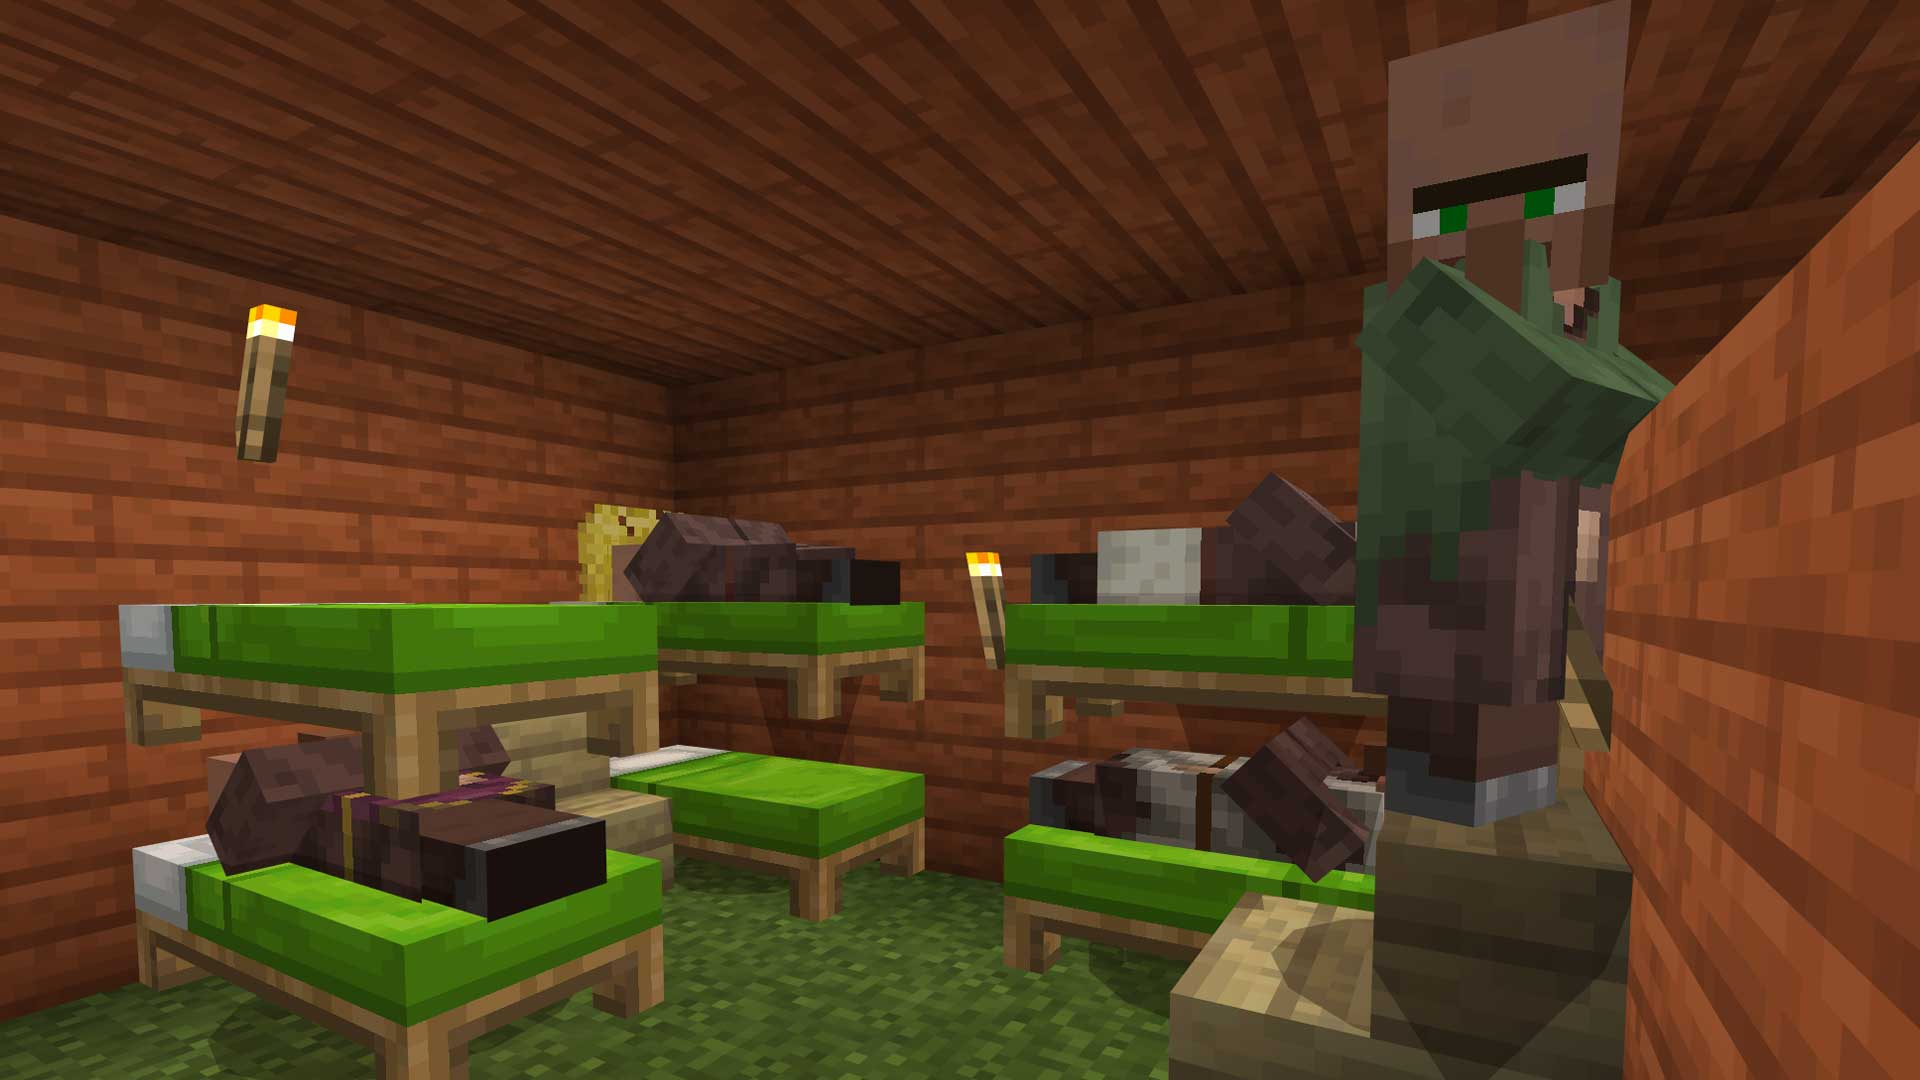 Minecraft Villager Bunk Beds For Compressed Living Gamerheadquarters